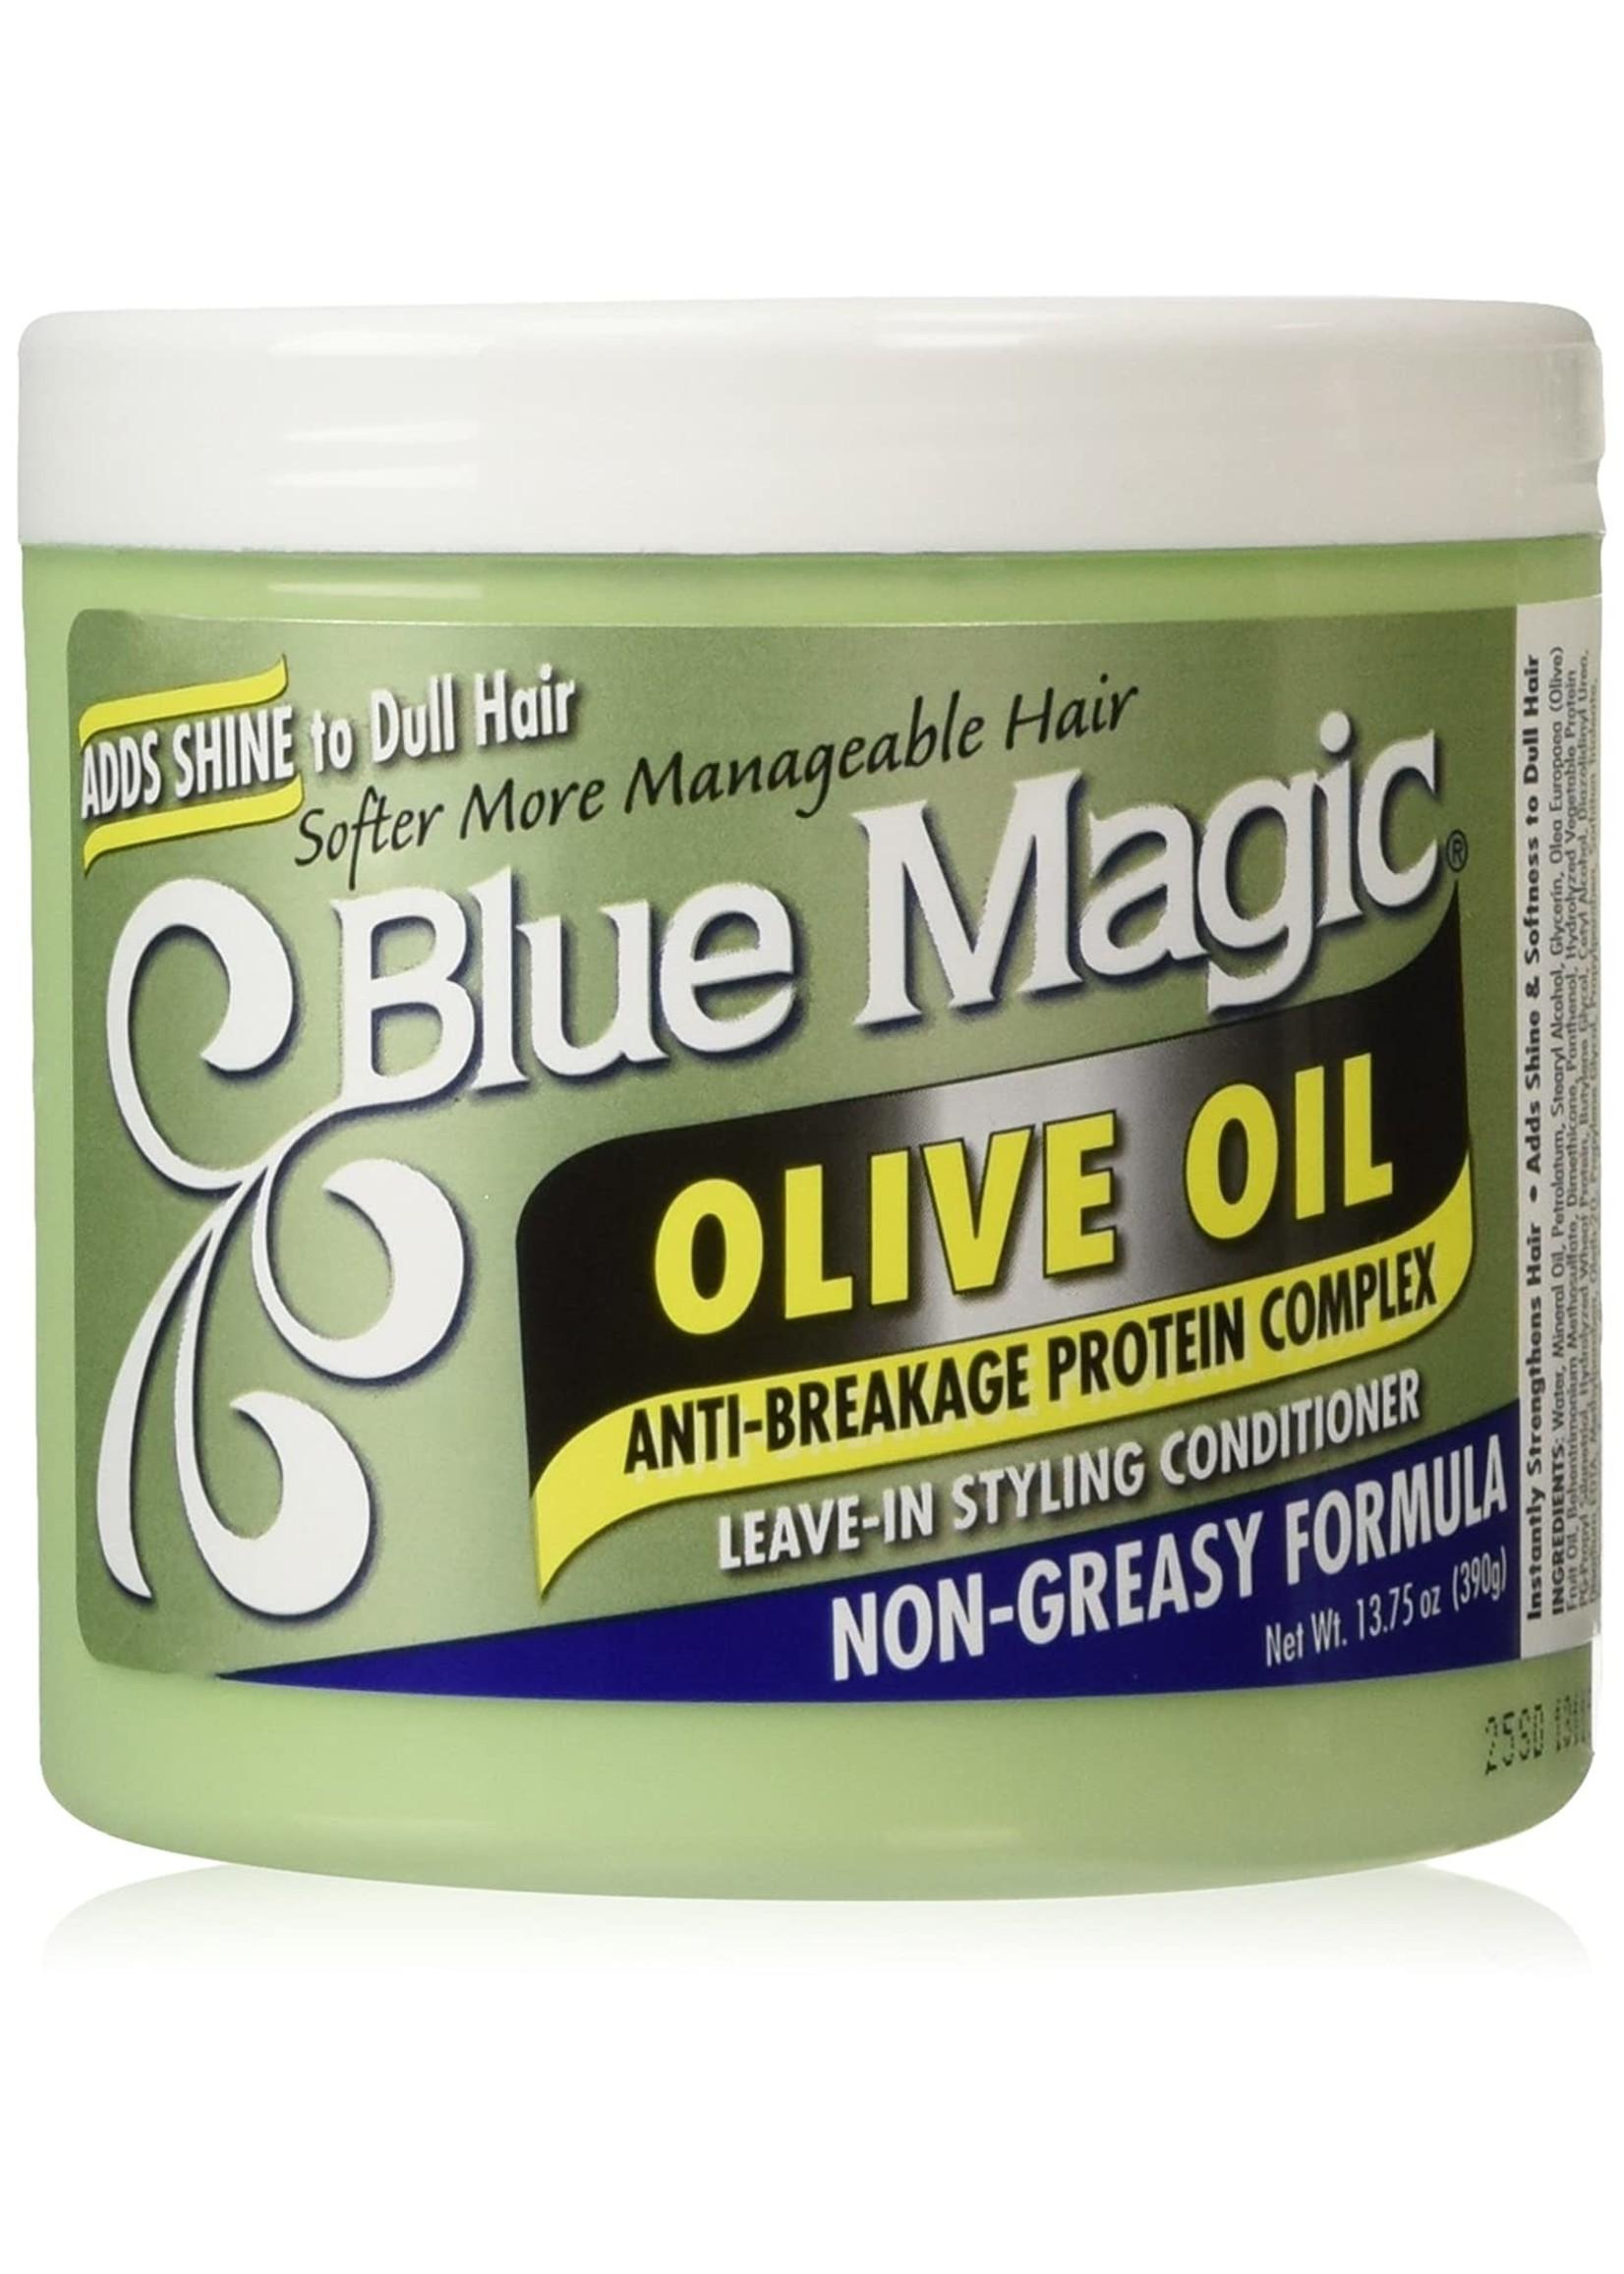 Blue Magic Anti-Breakage Olive Oil